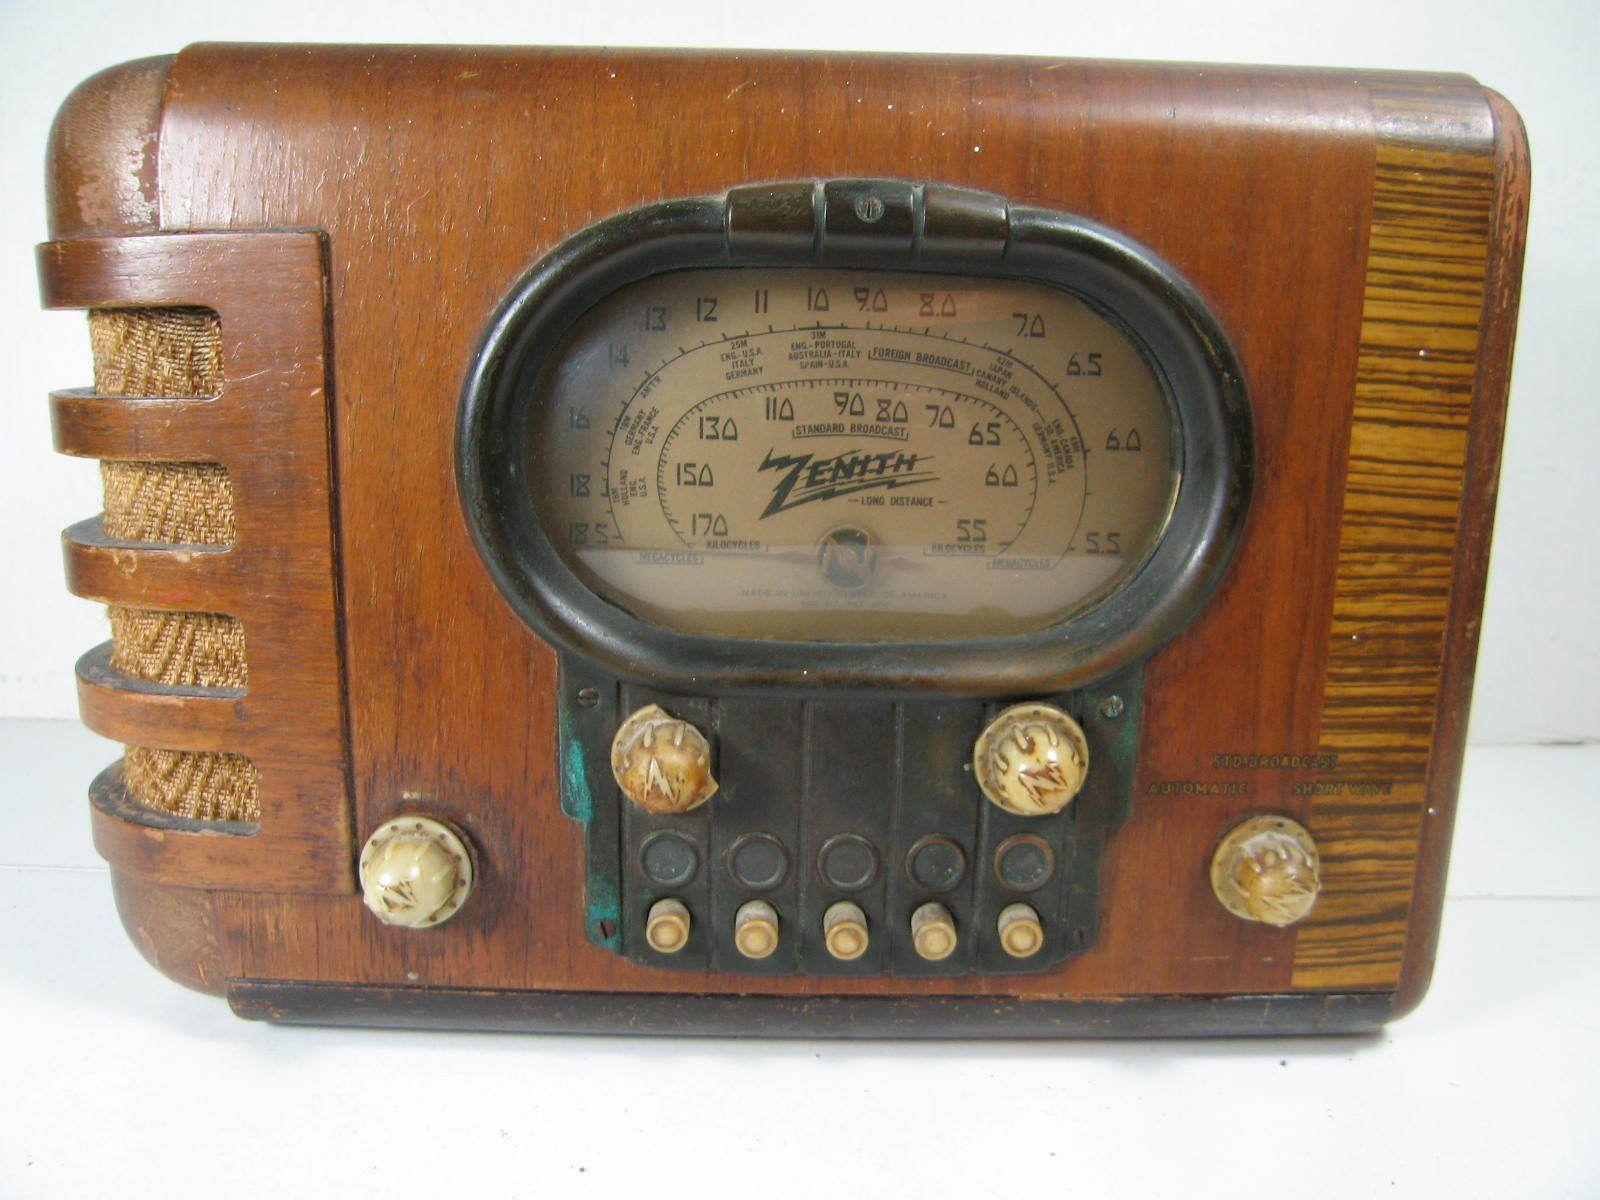 Zenith 1939 Tube Radio Model 5 S 319 For Parts Or Repair Ebay